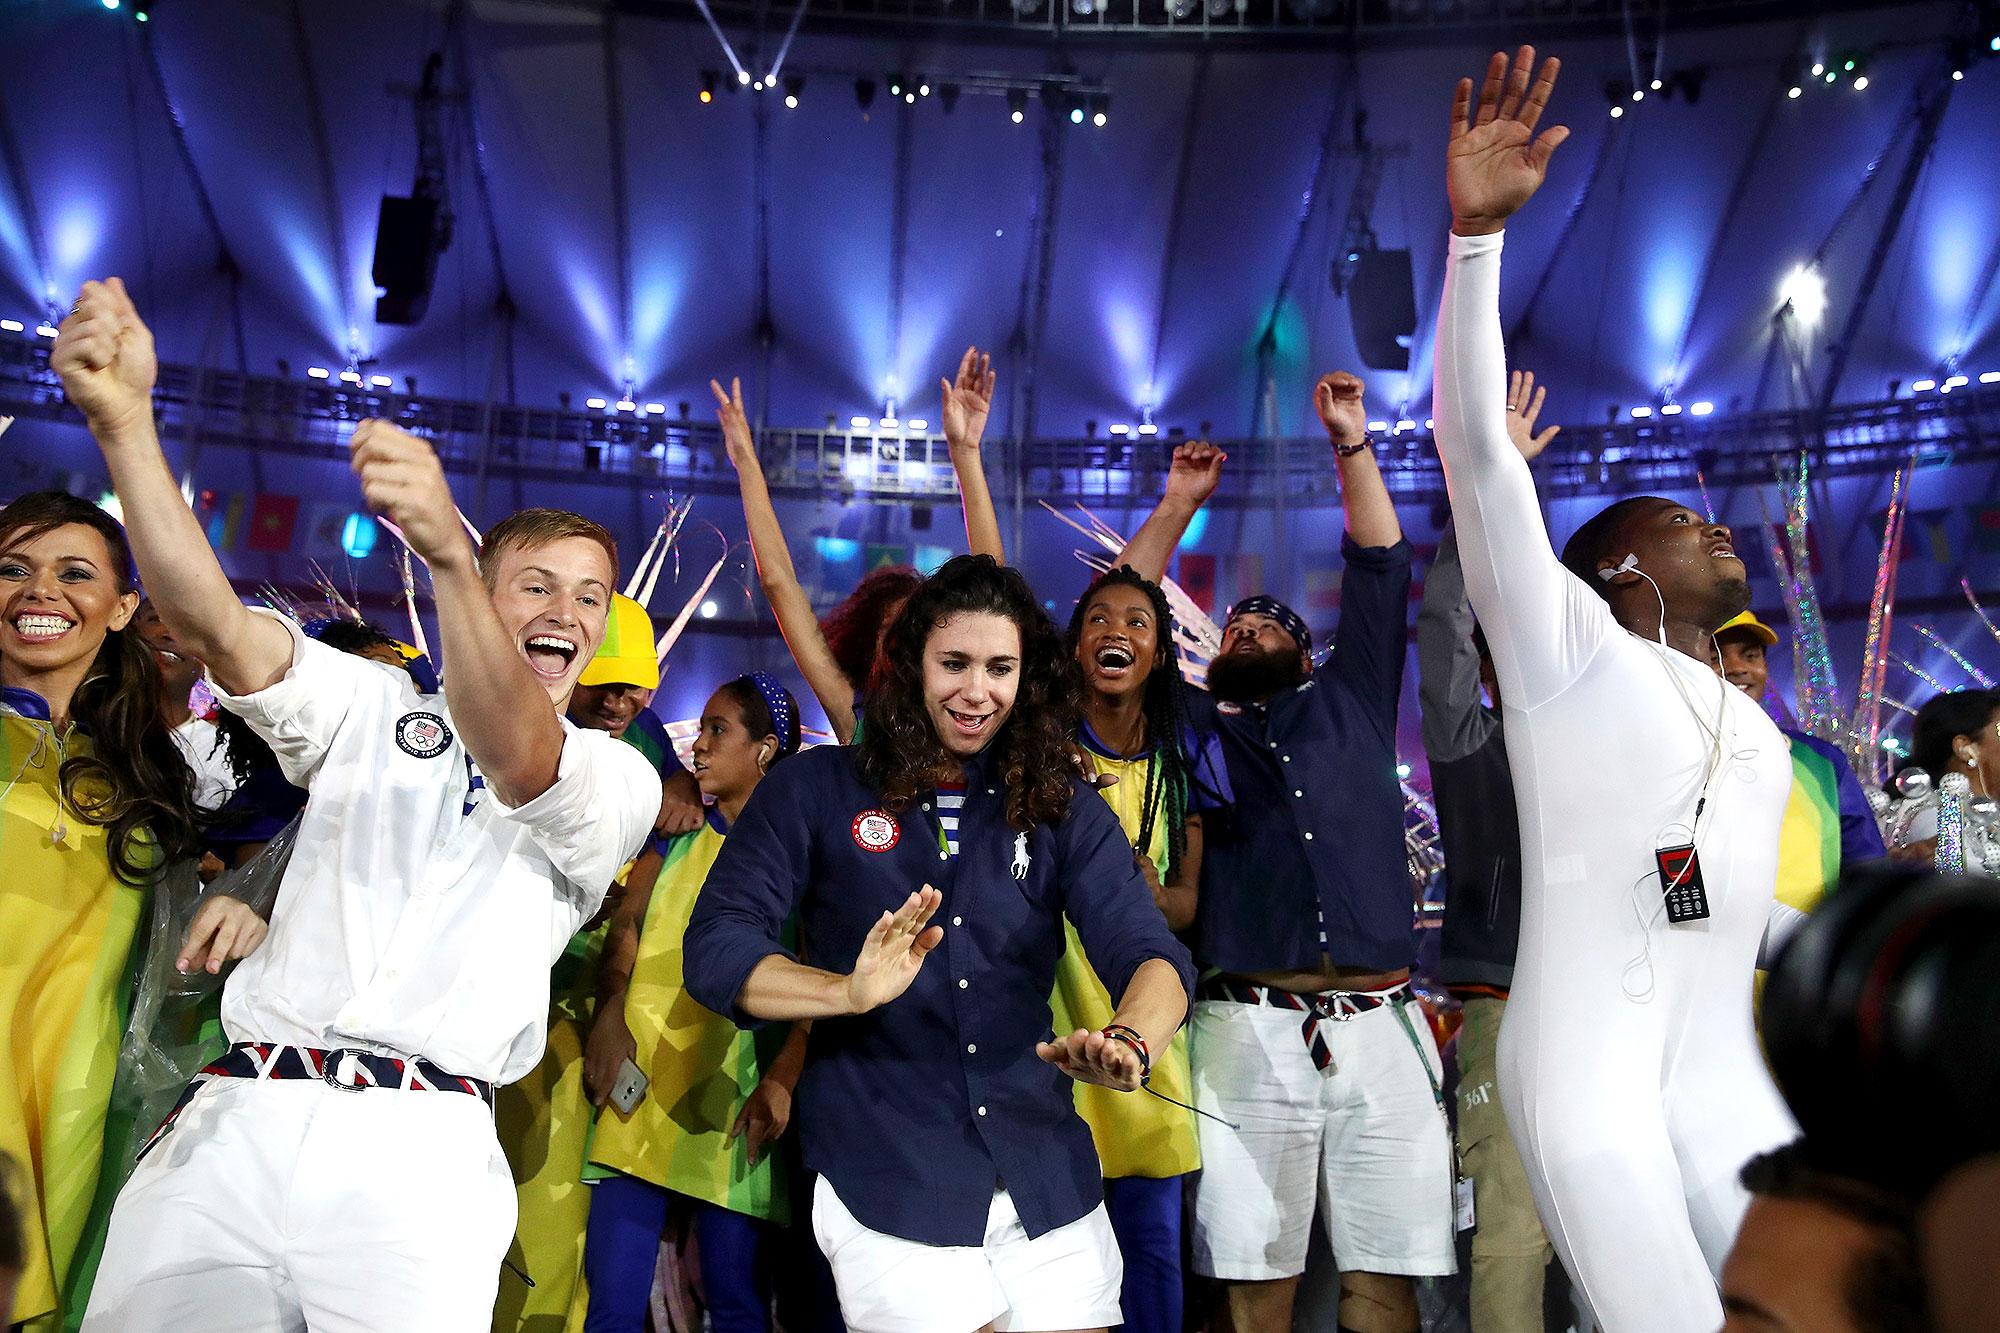 Nbc olympics closing ceremony sweepstakes